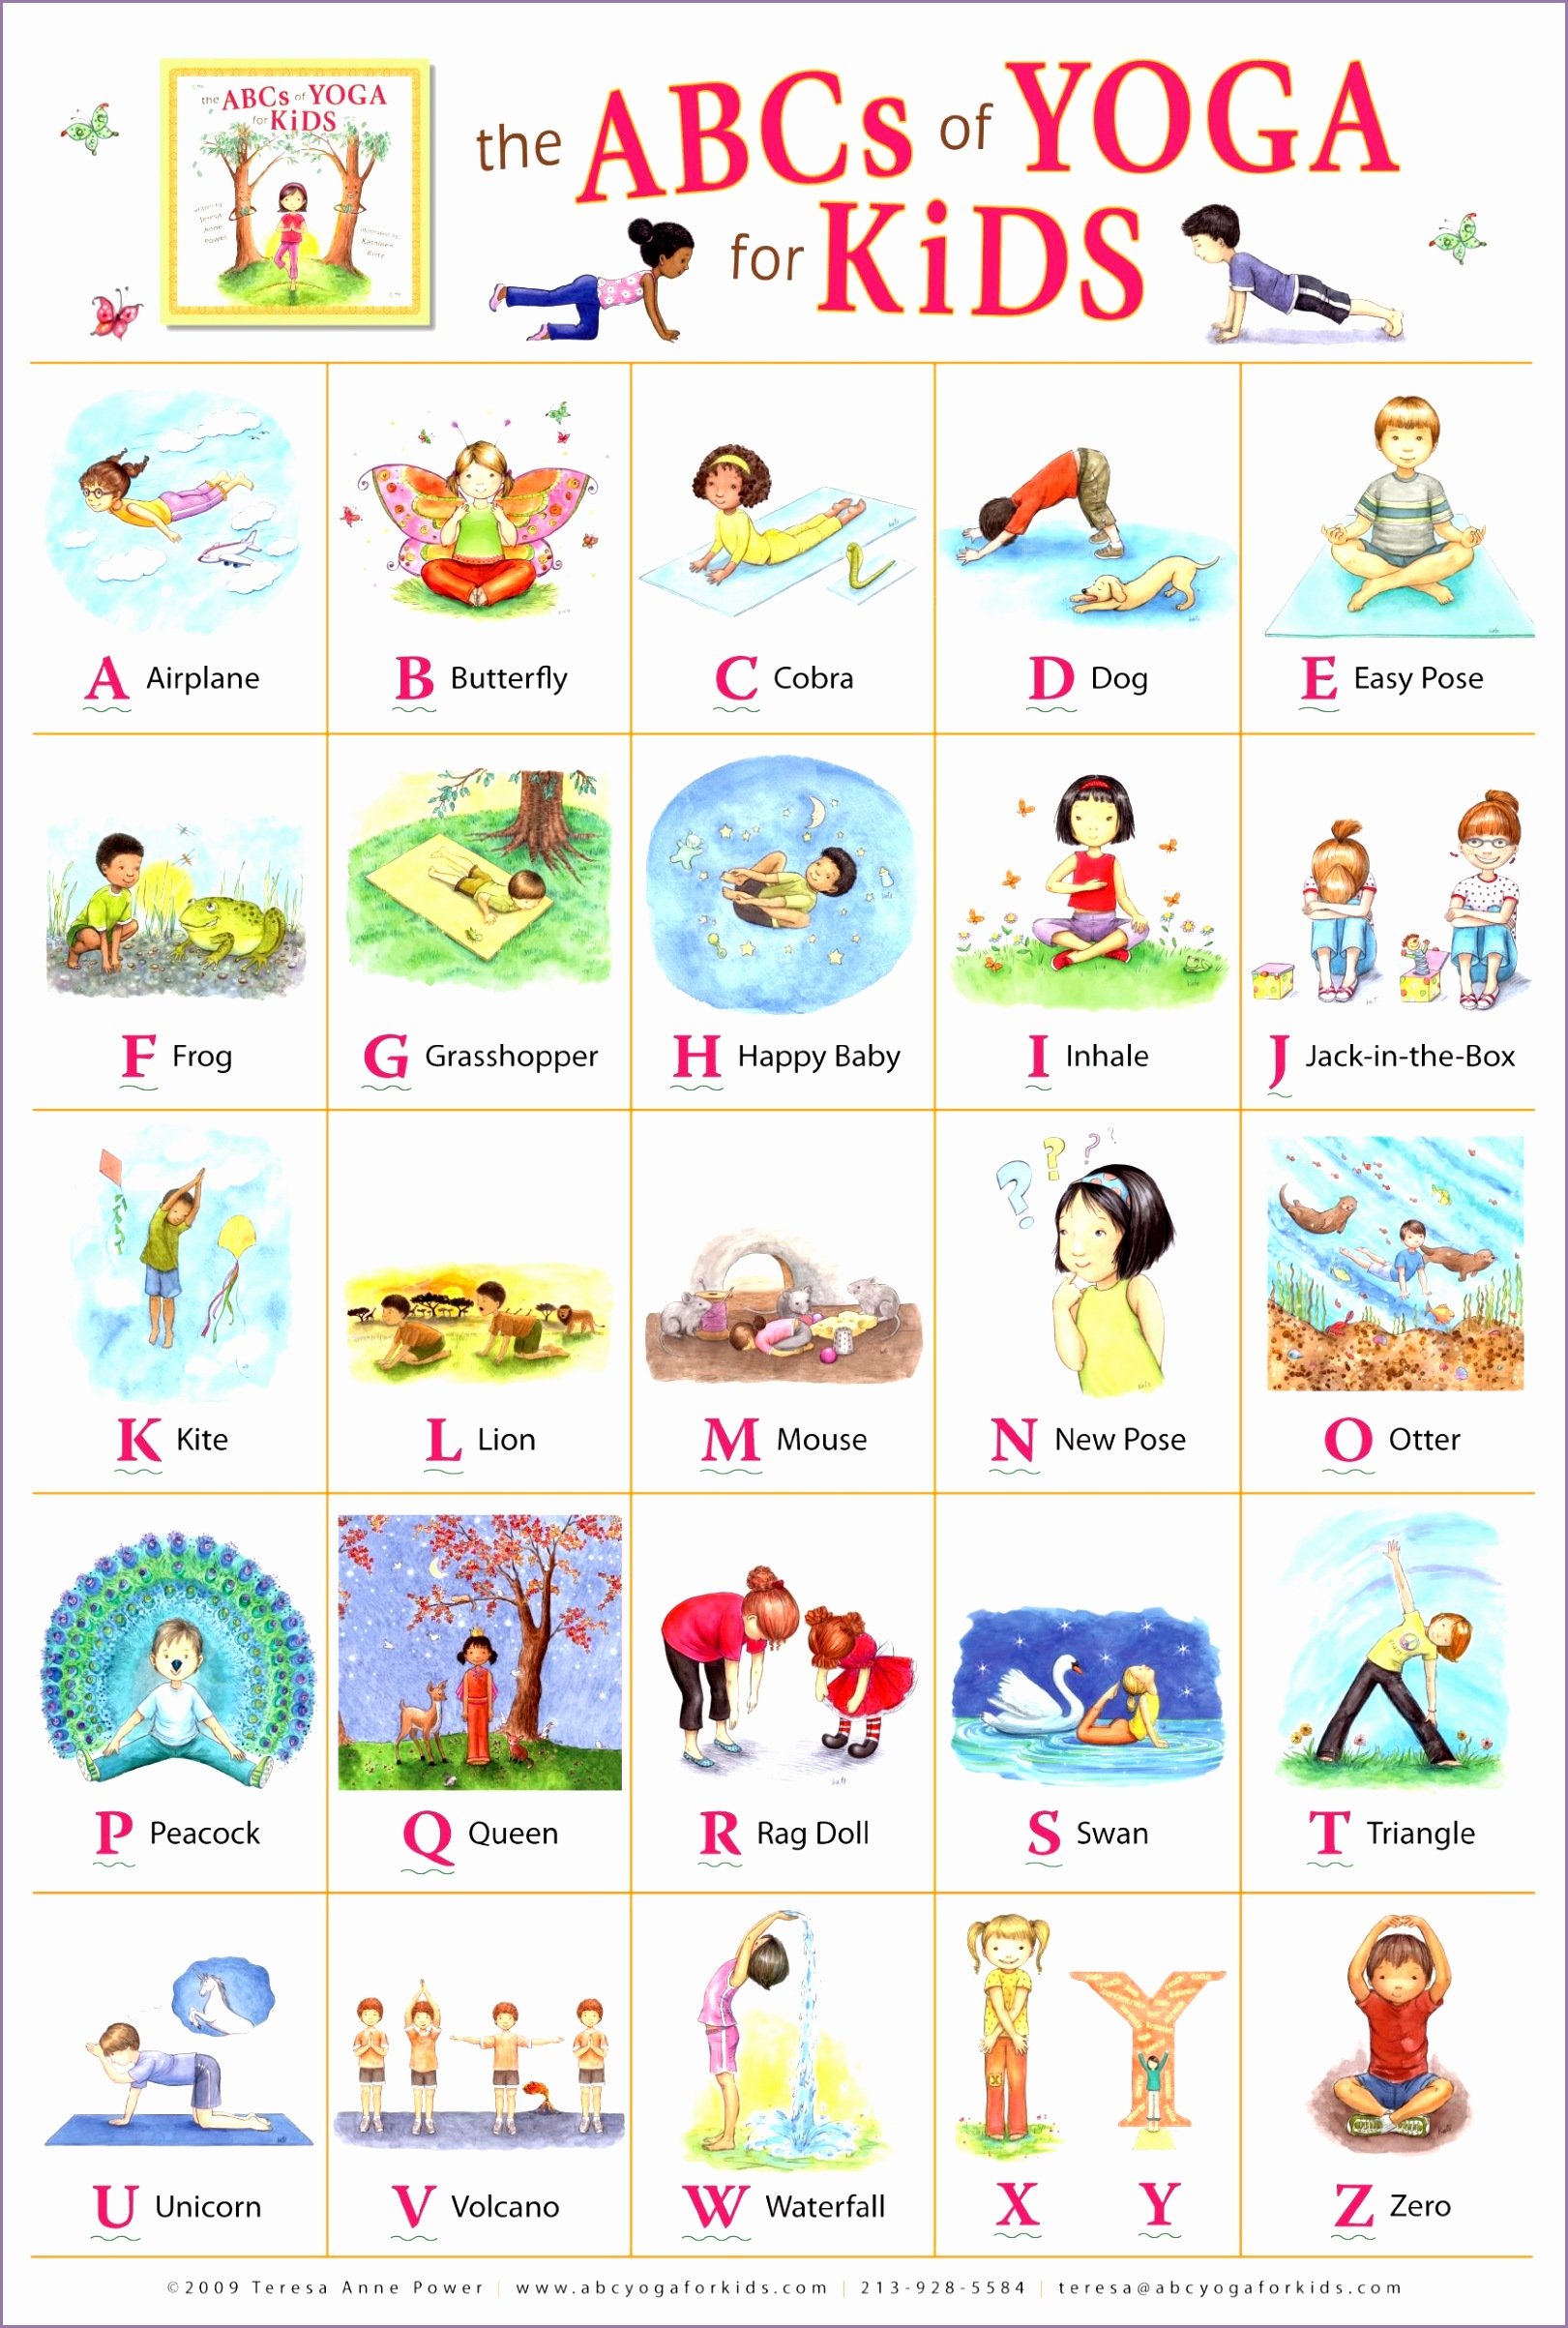 photograph regarding Yoga Poses for Kids Printable named yoga poses for children printable